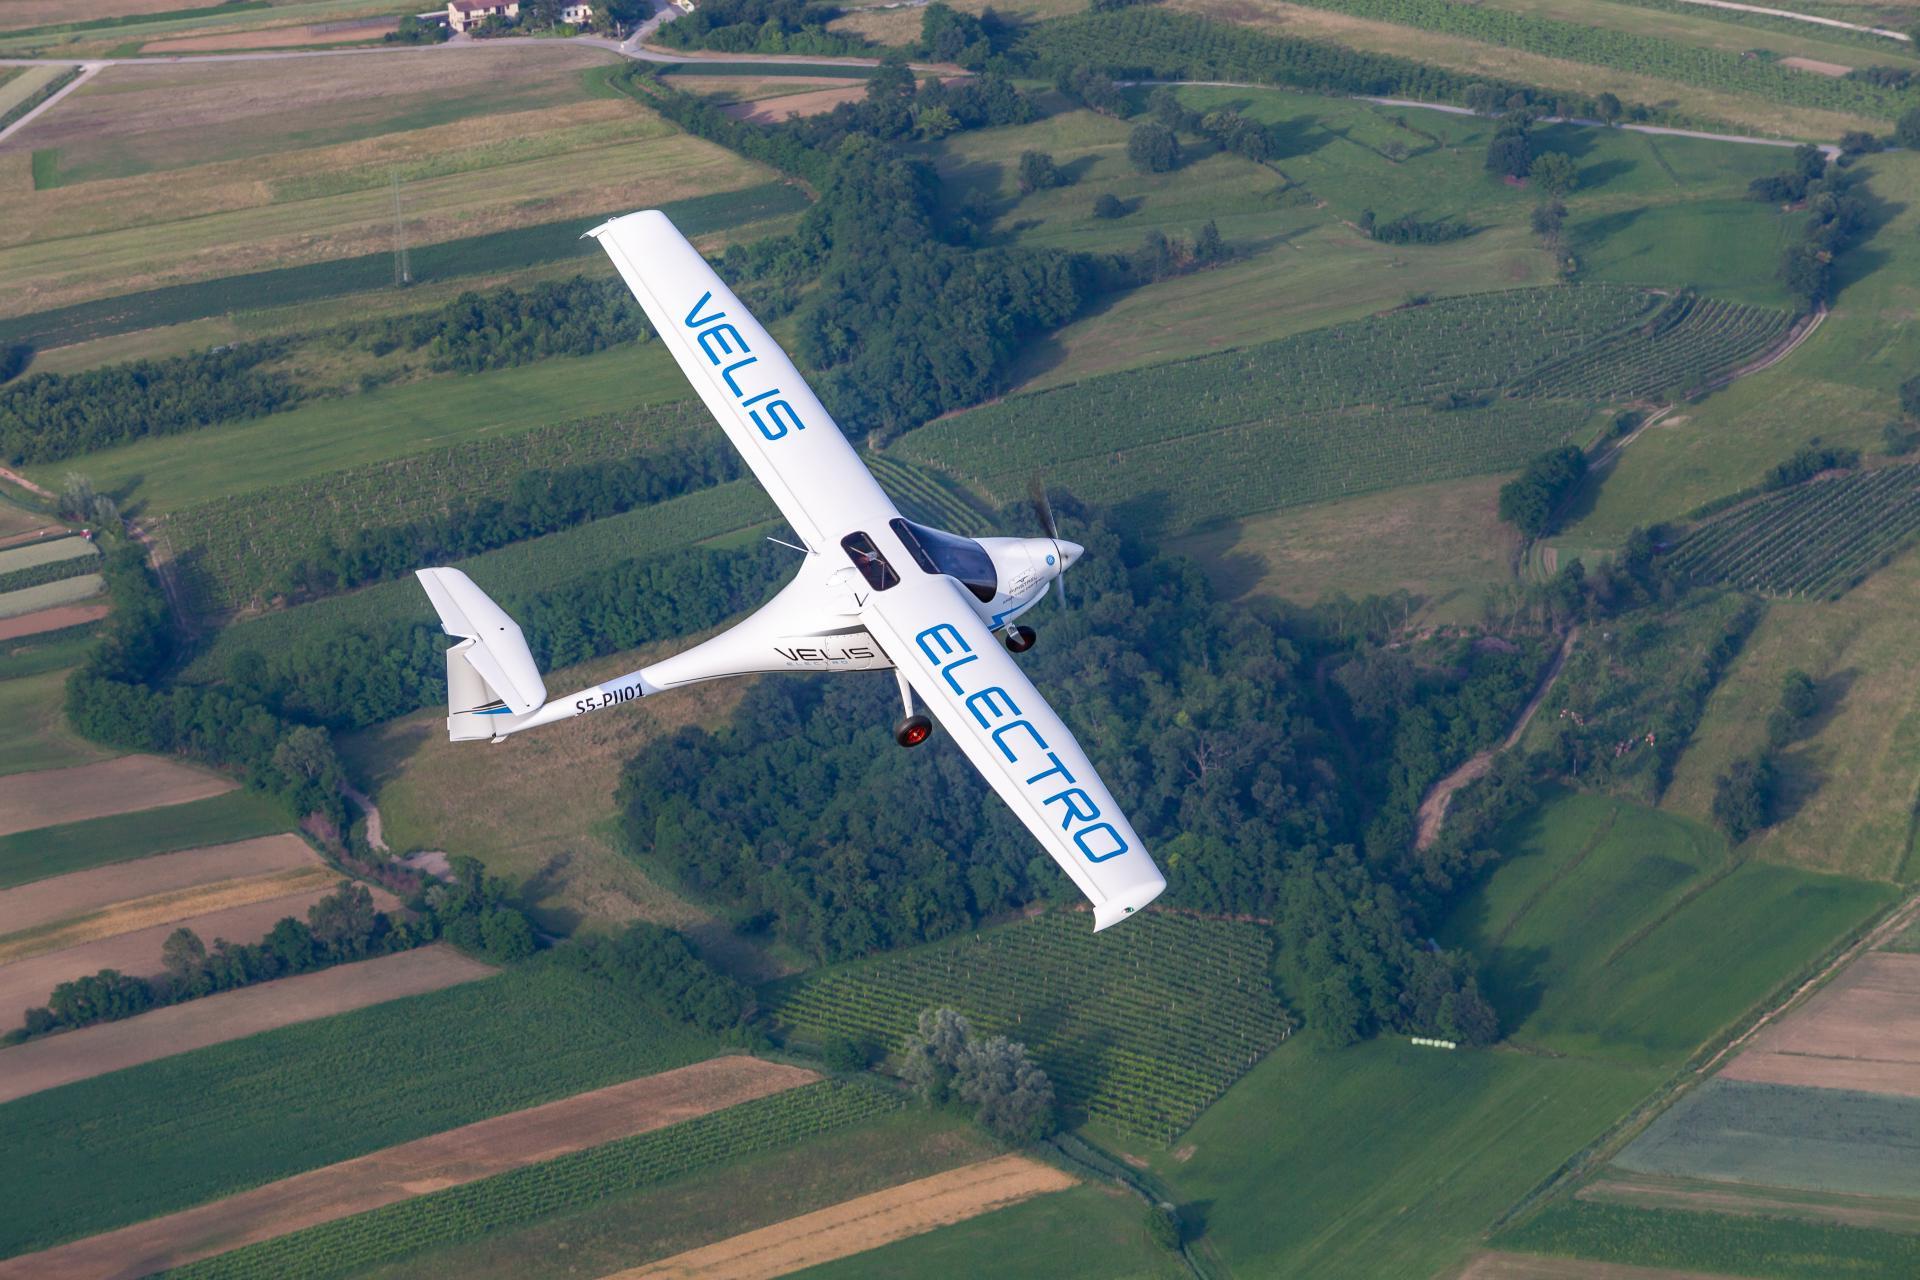 Samolot elektryczny - Velis Electro